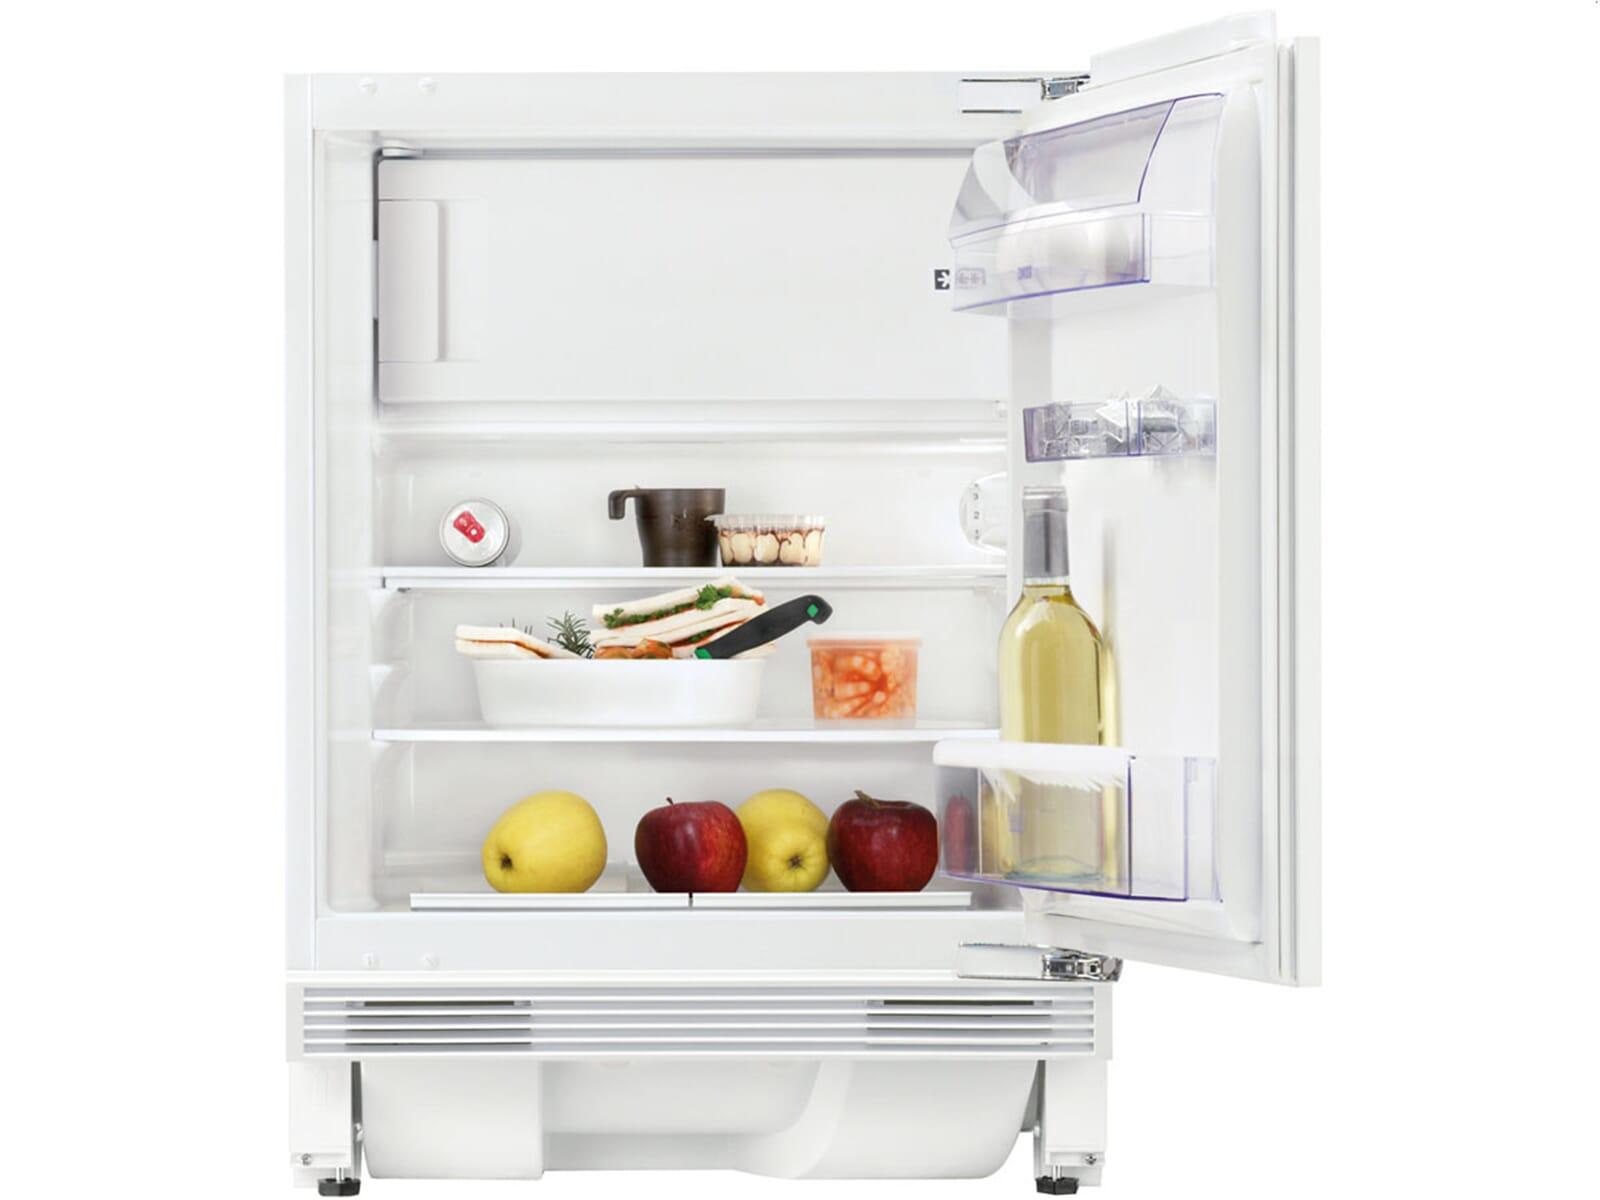 Kühlschrank Unterbau : Unterbau kühlschrank unterbau kühlschrank uikp